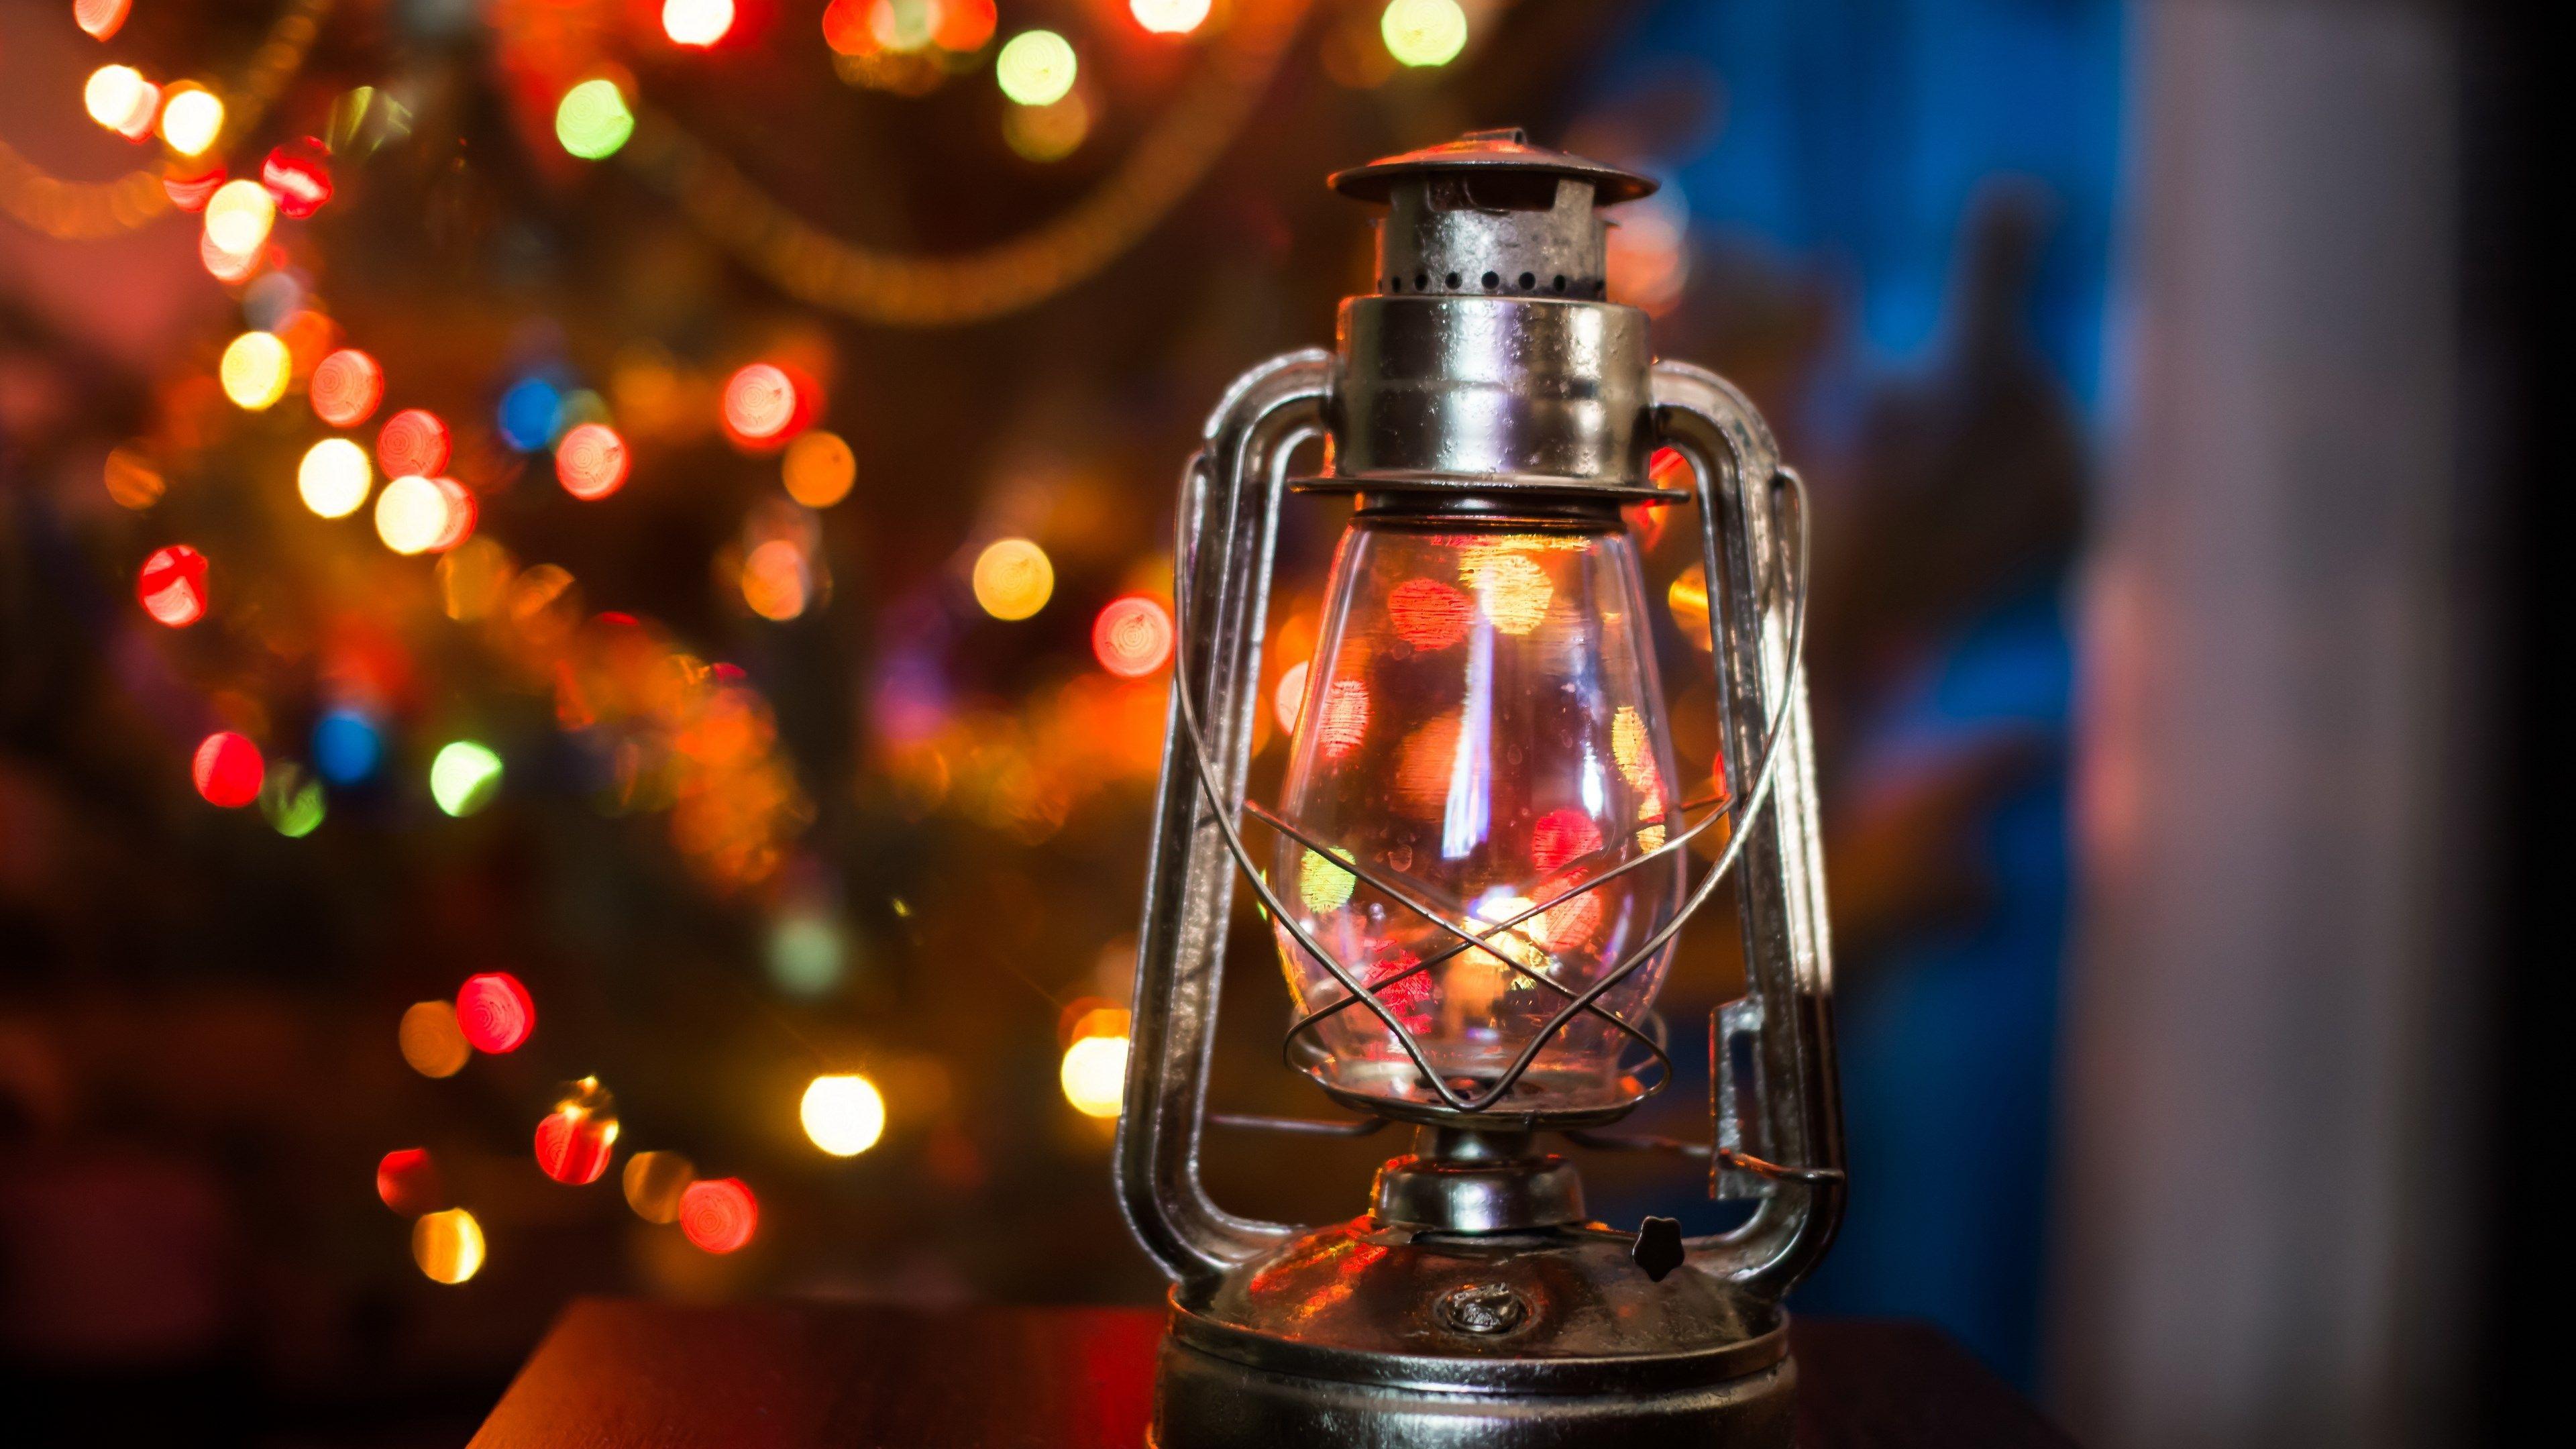 4k wallpaper image download (3840x2160) Christmas lamp